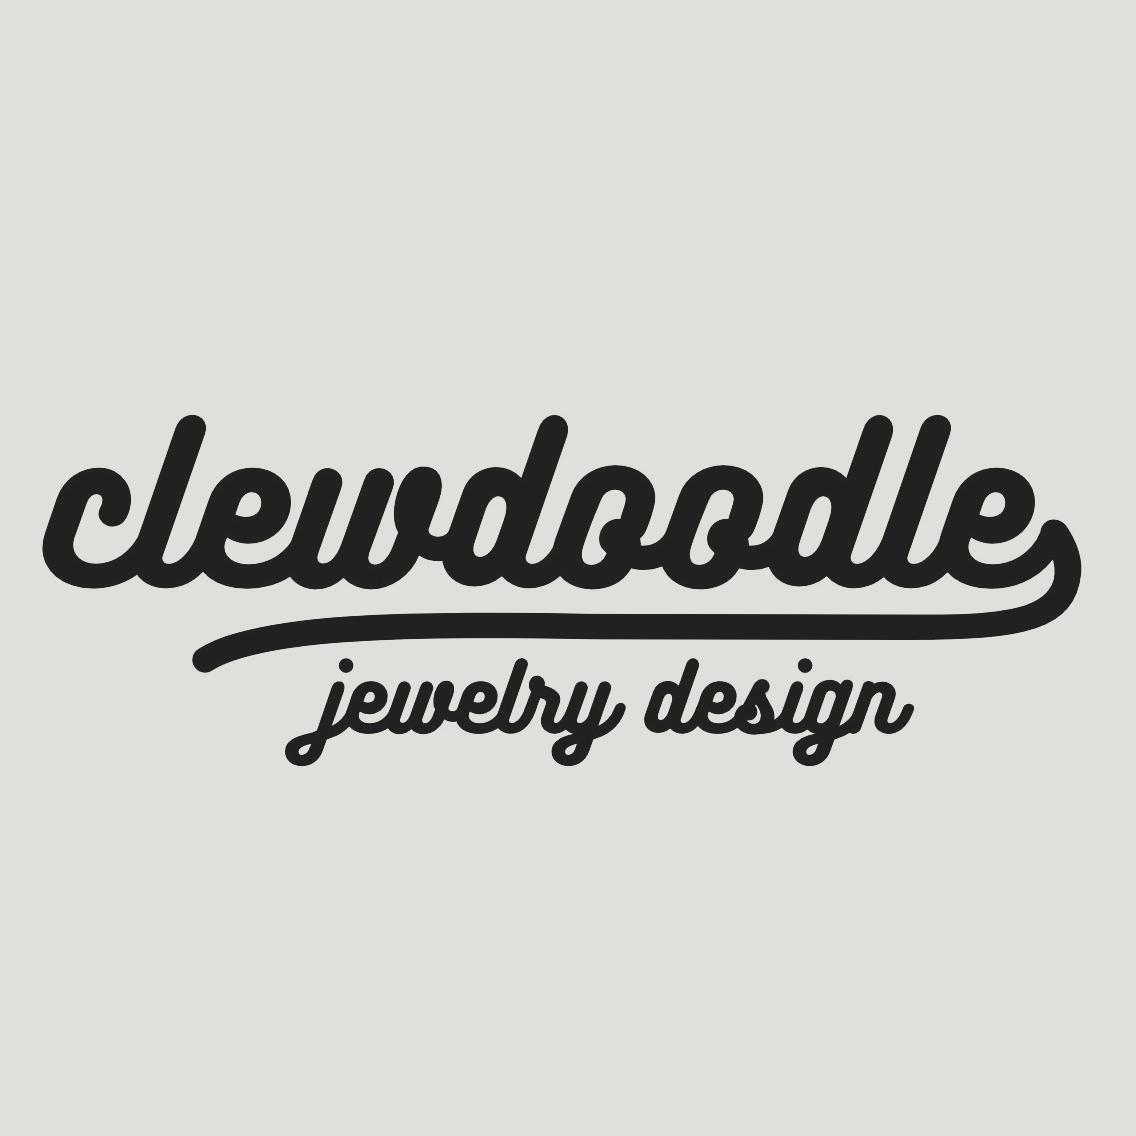 Clewdoodle Jewelry Design